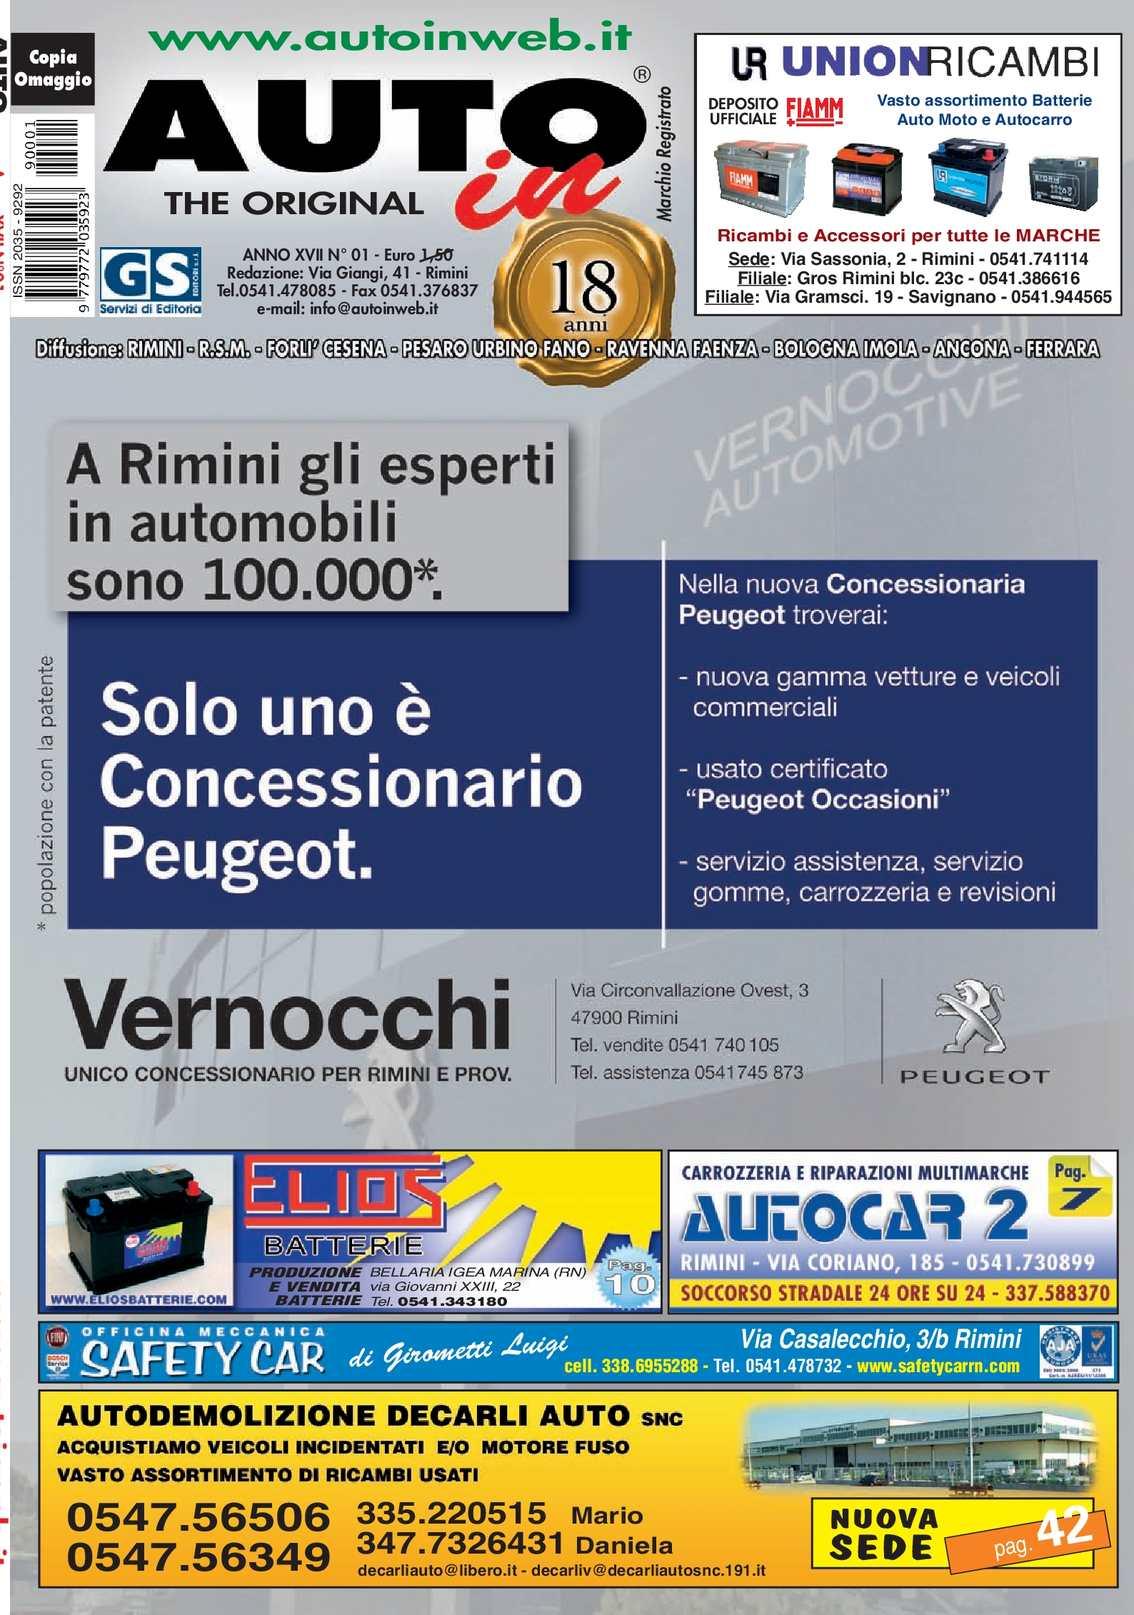 kit elettrico 13 poli Fiat Ulysse Lancia Z 2002-2005 gancio estraibile